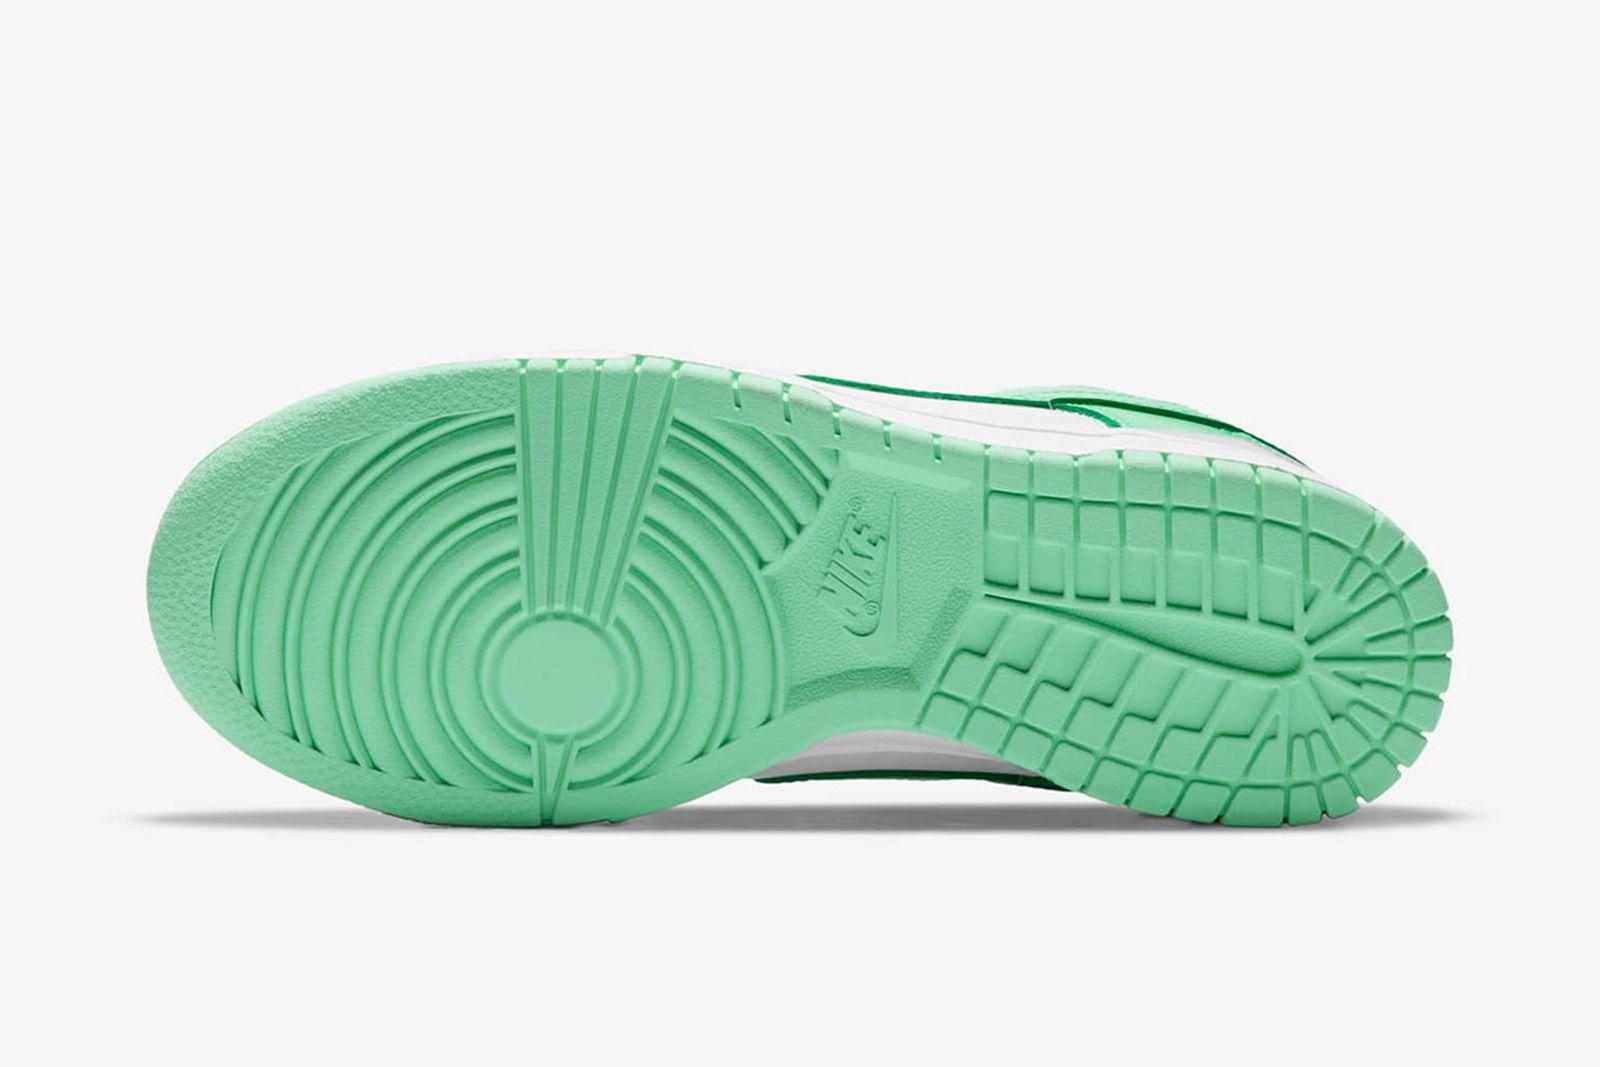 nike-dunk-low-green-glow-release-date-price-05